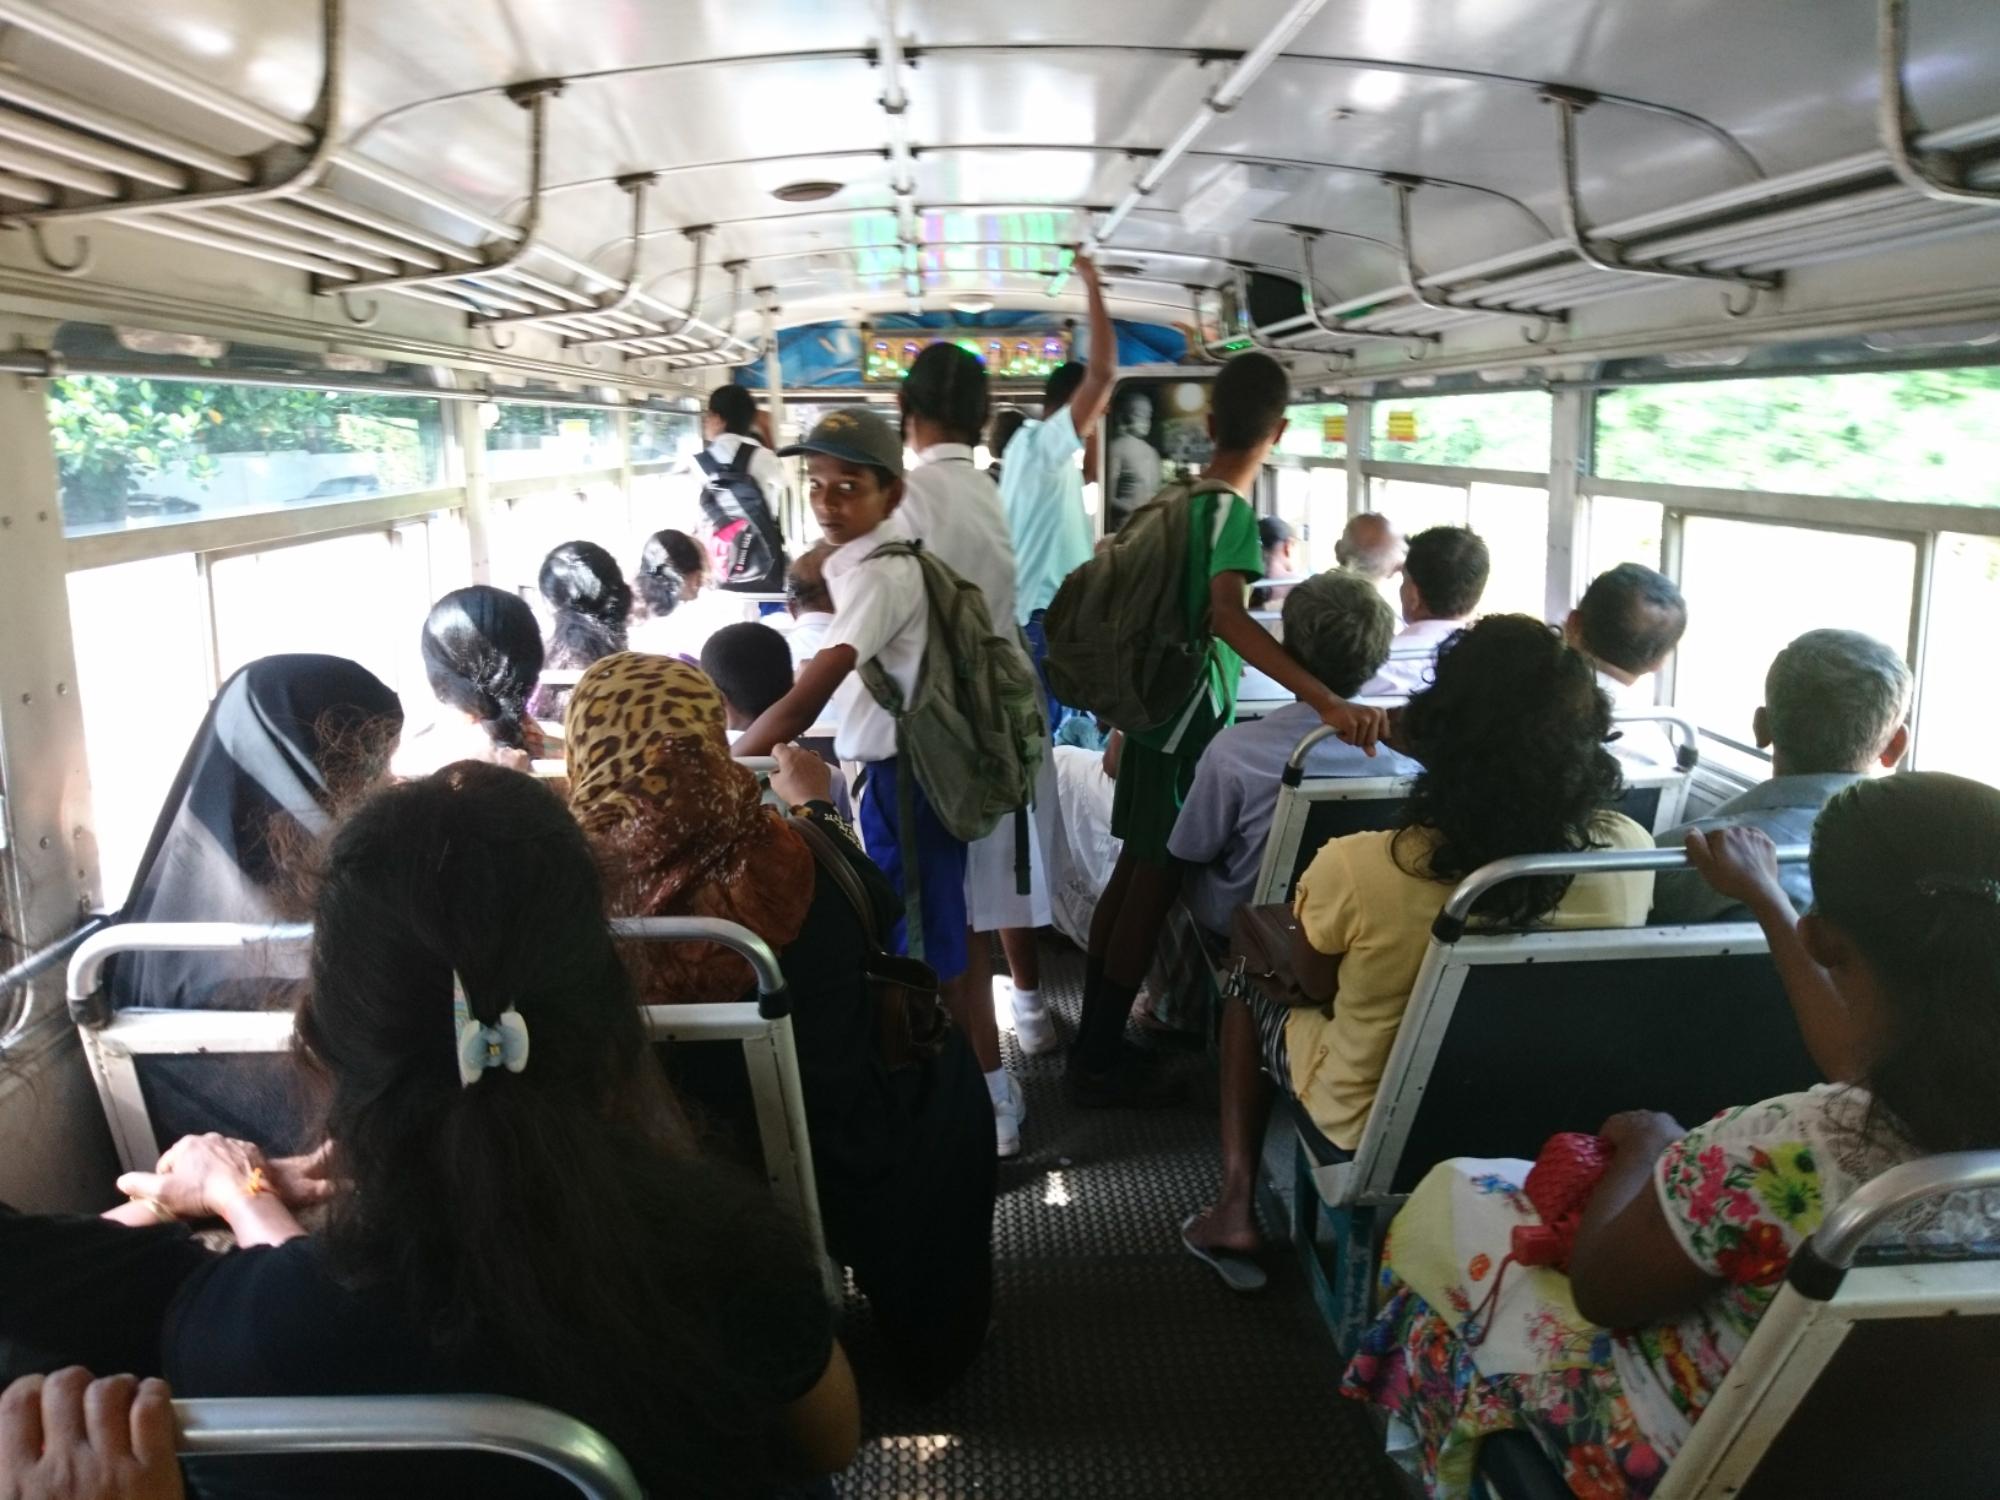 Bus 334/3 de Matara à Tissa, côte sud